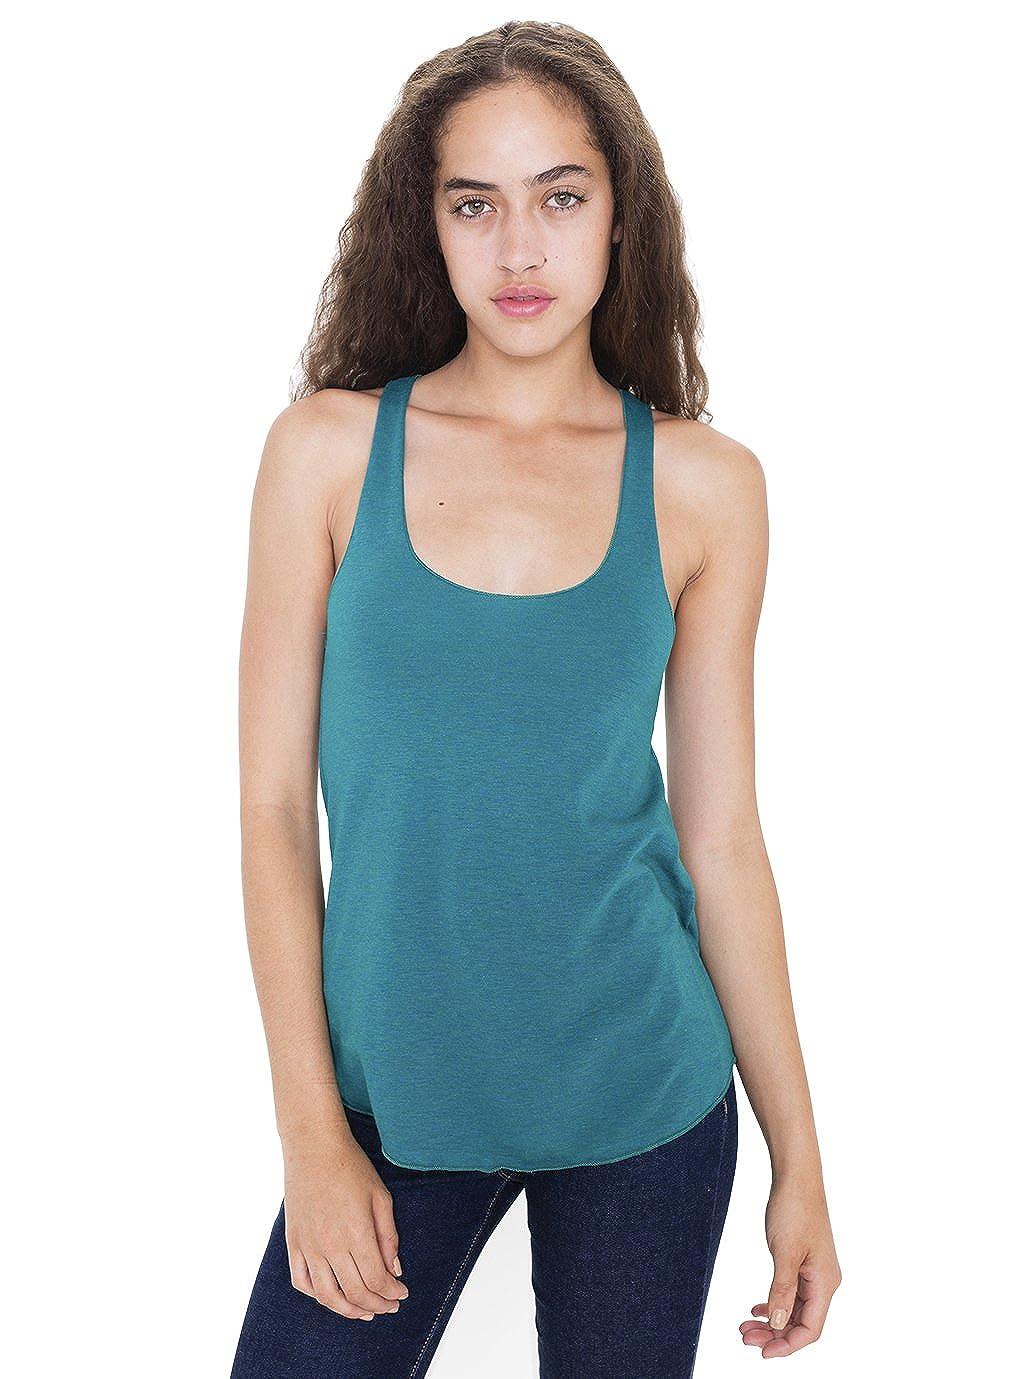 160dd1c3338362 American Apparel Women s Tank Top Cami Shirt  Amazon.co.uk  Clothing